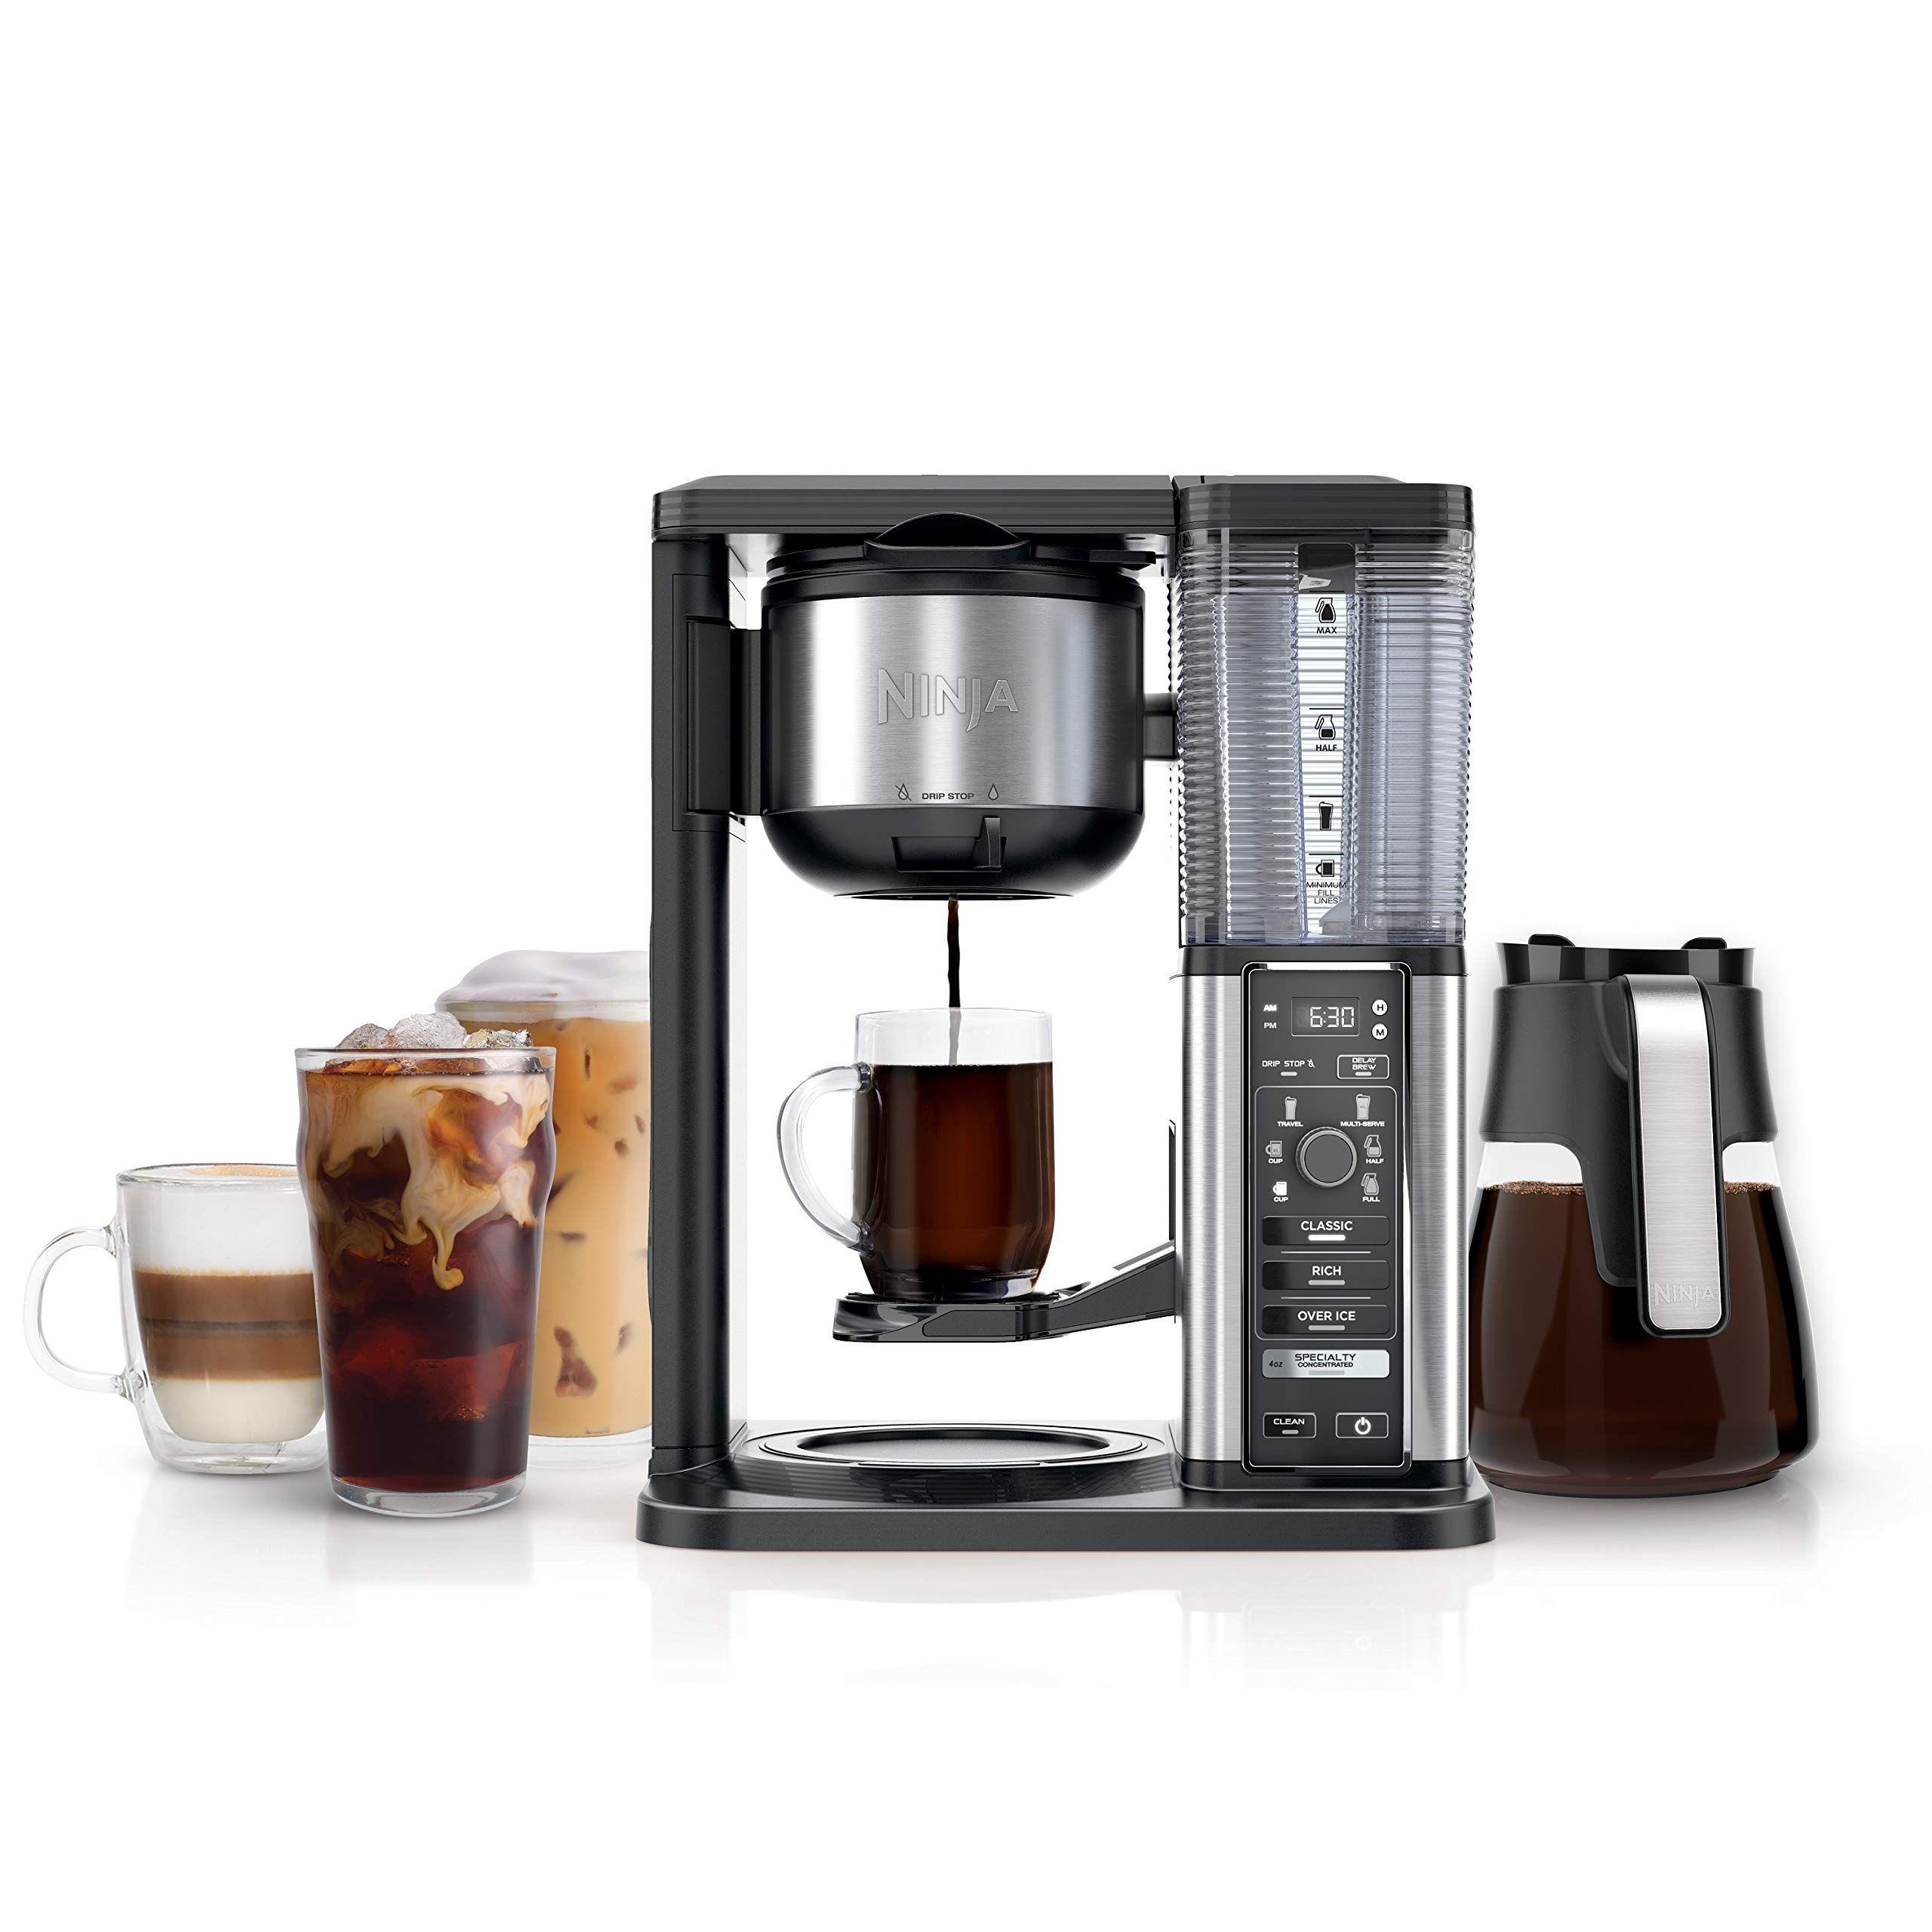 Ninja Specialty FoldAway Frother (CM401) Coffee Maker